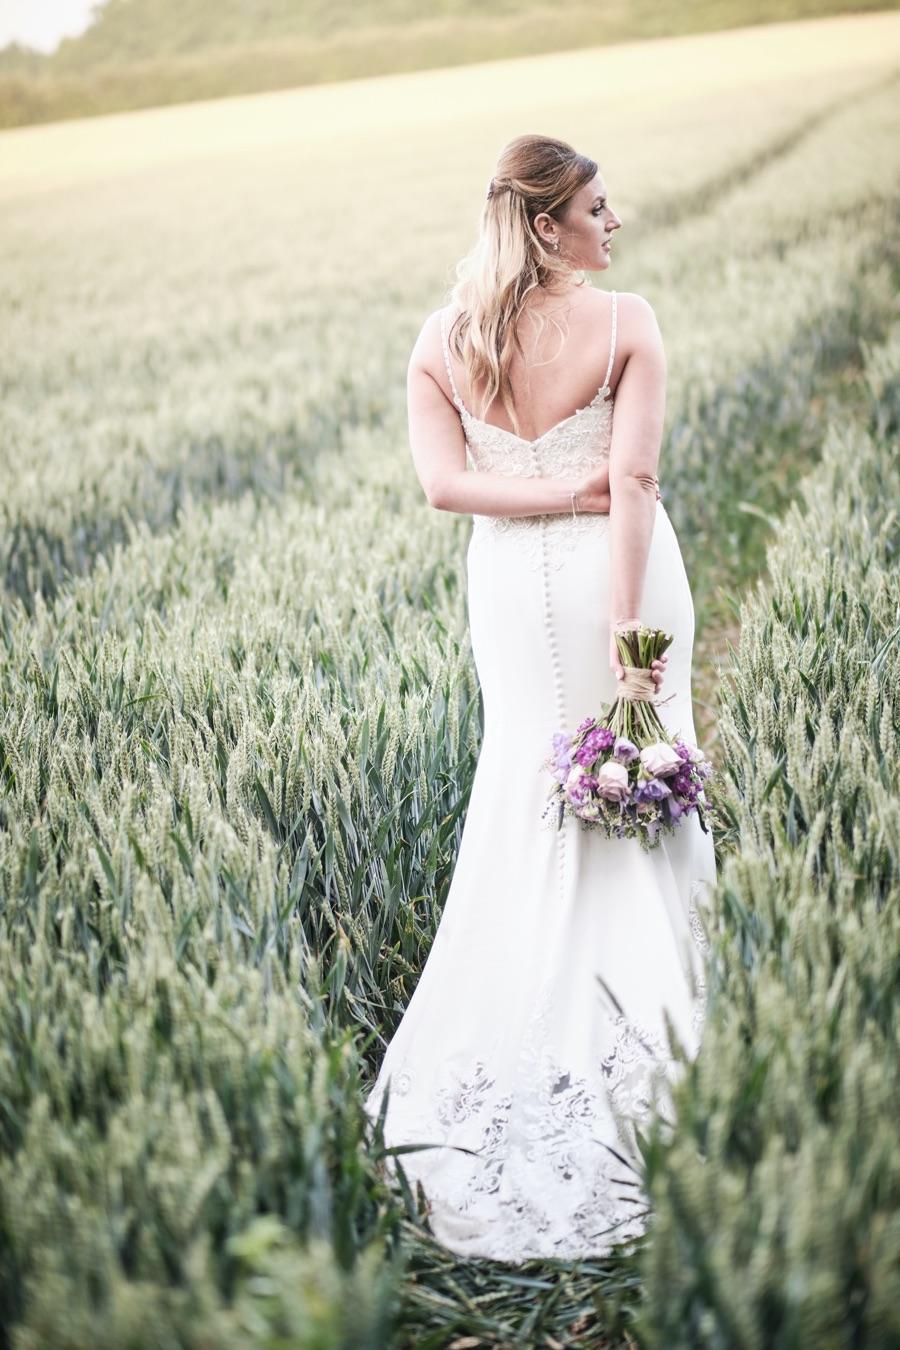 Real Wedding at Winters Barns, Canterbury by Howling Basset